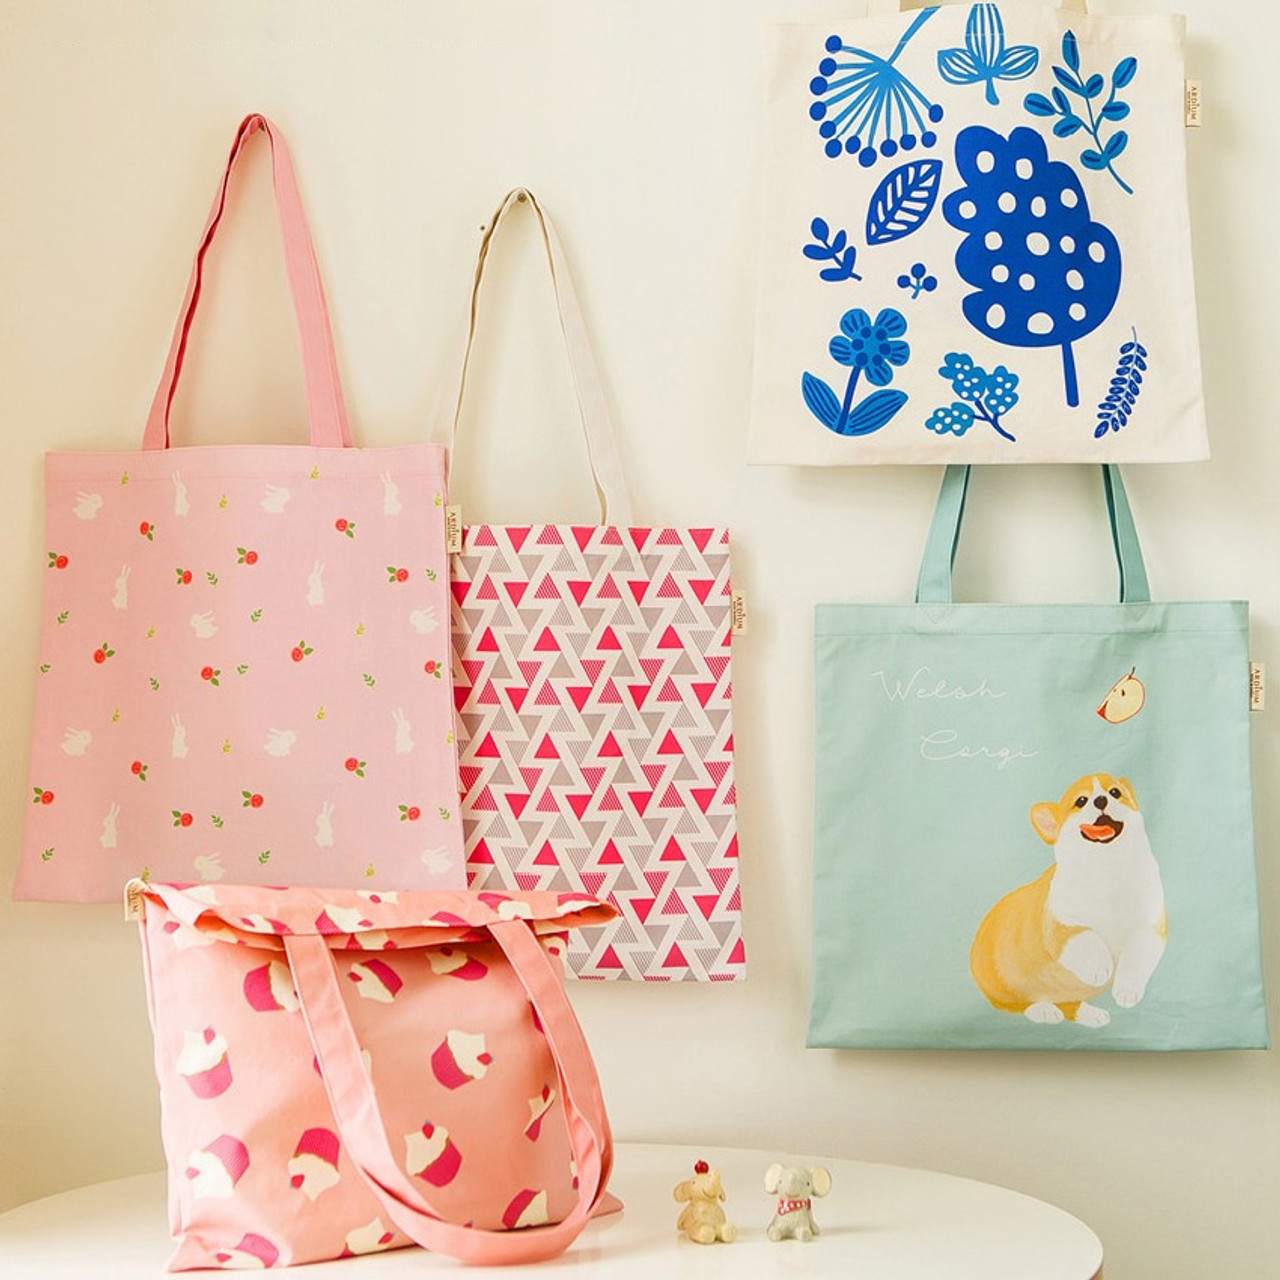 deb73d2c0 Ardium Colorful water resistant cotton canvas tote bag - fallindesign